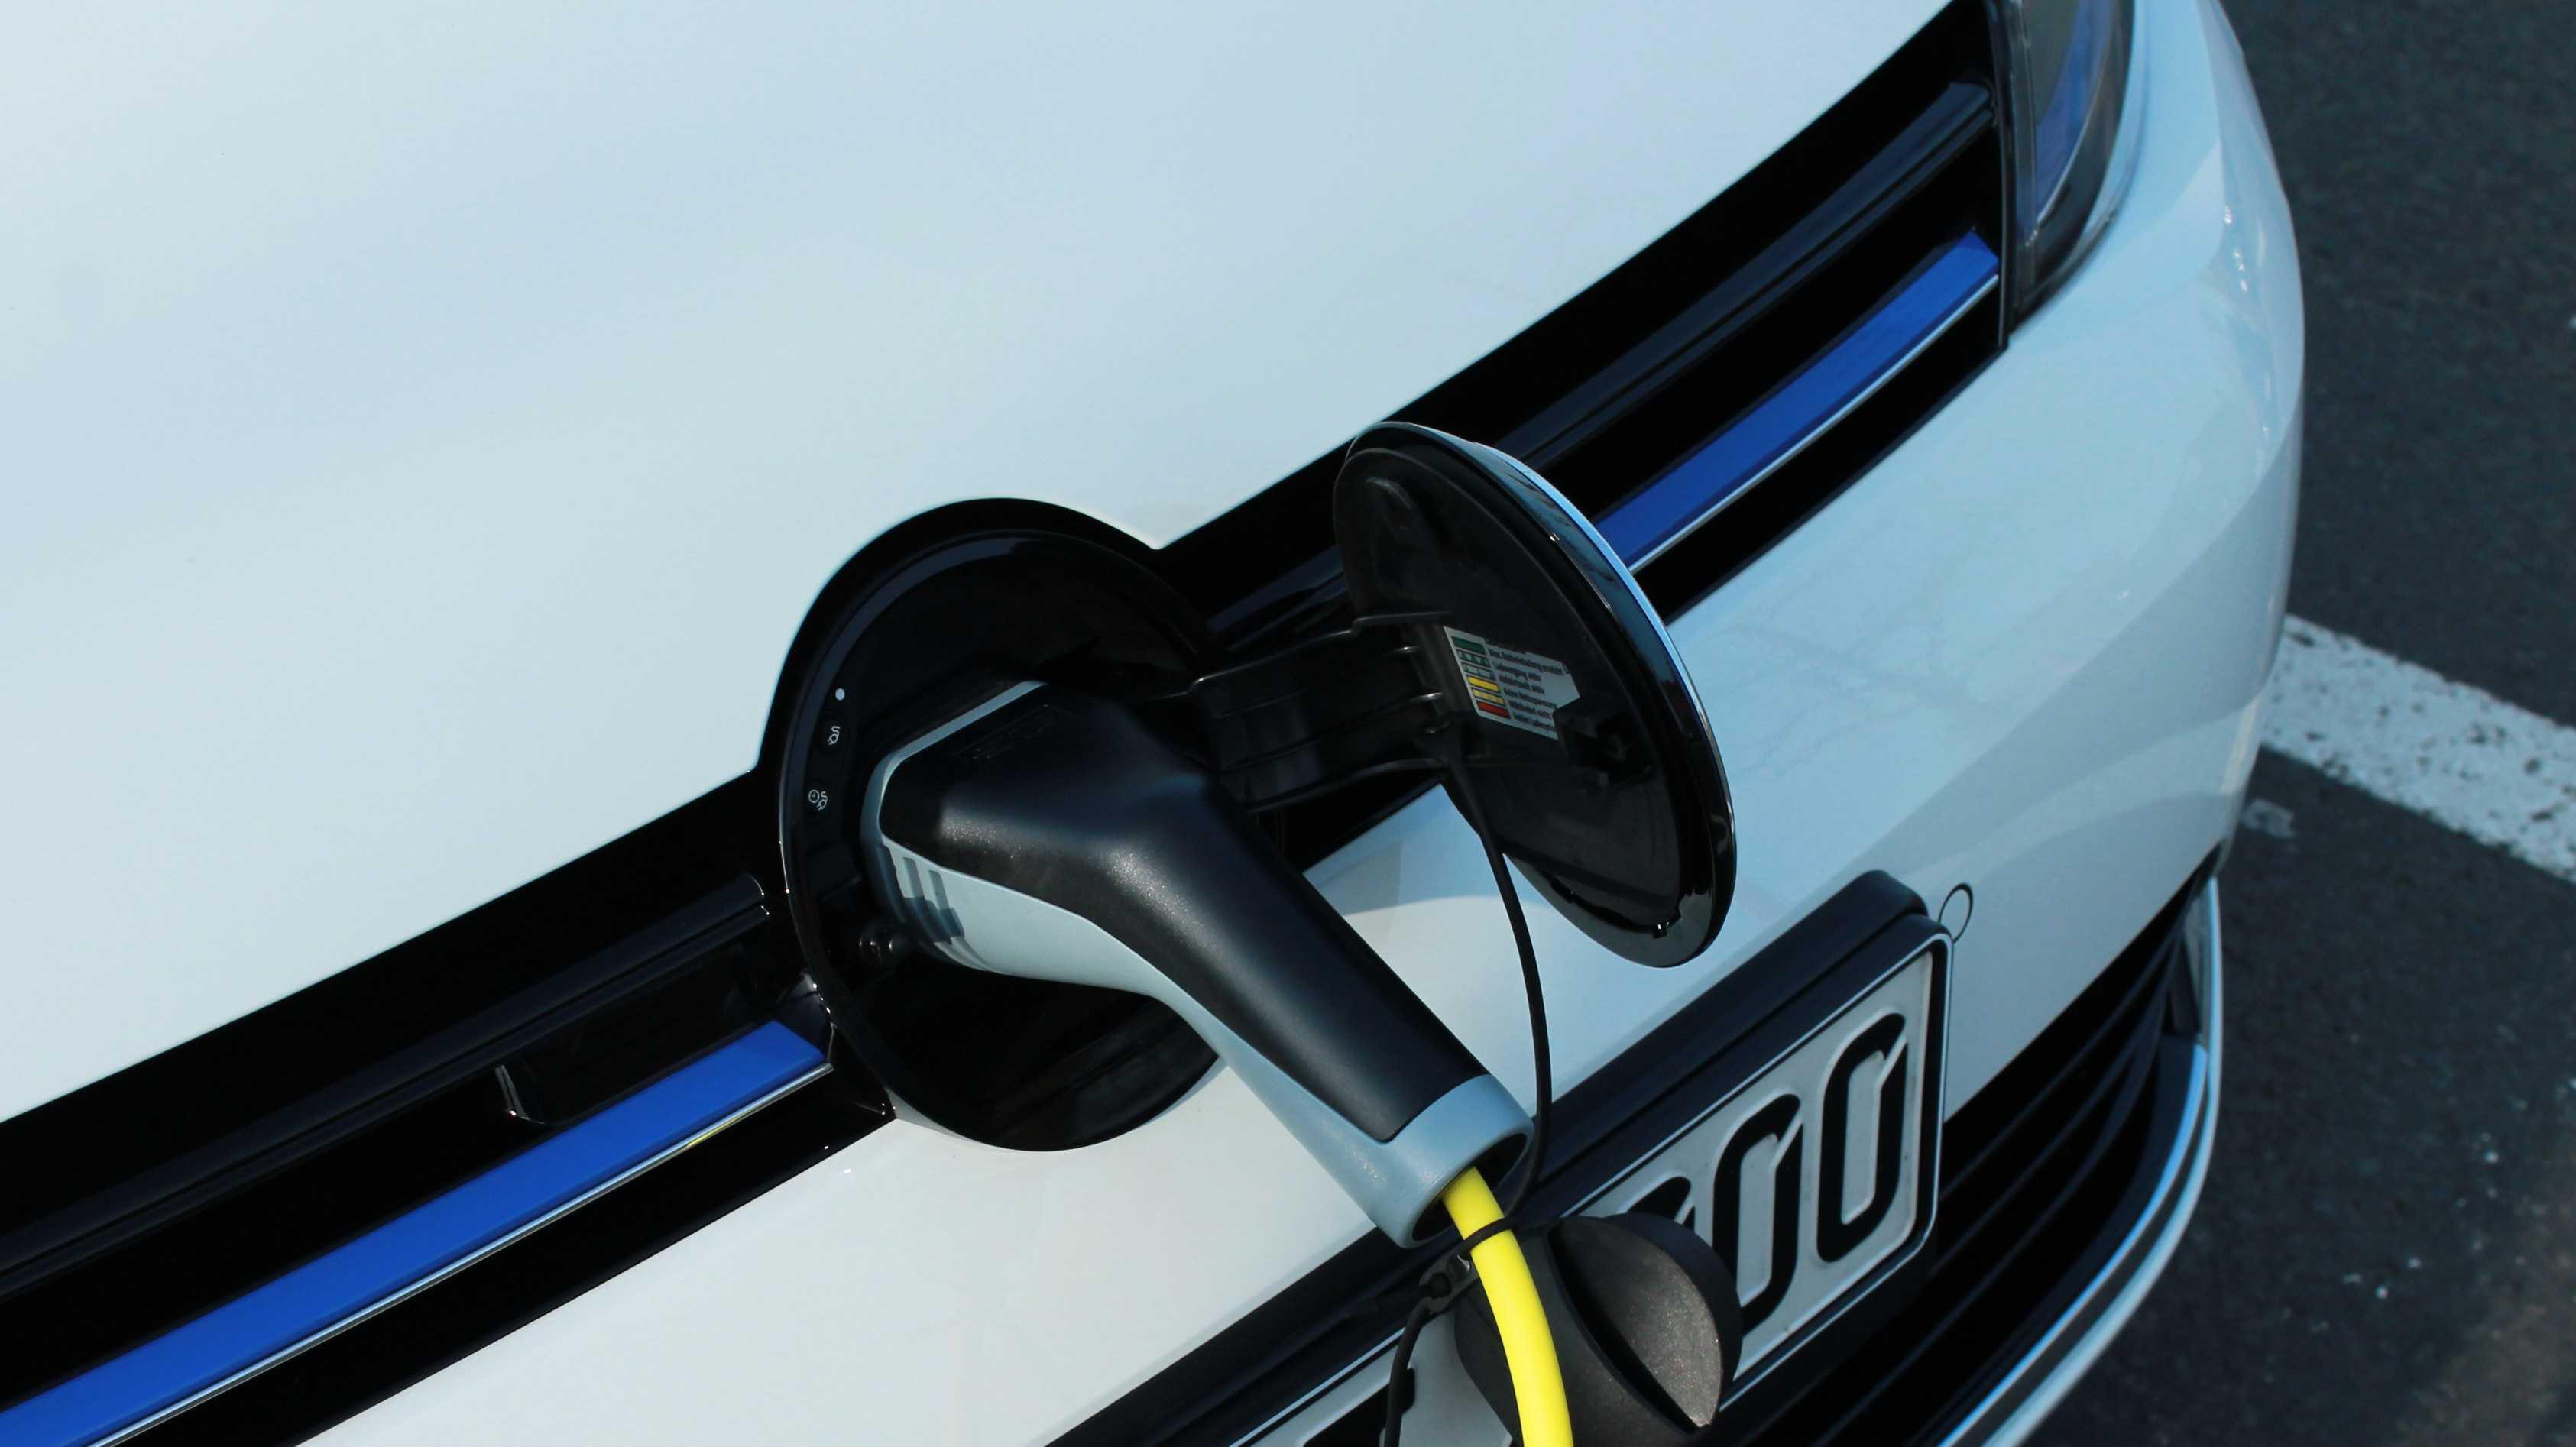 Elektroautos in China: Zwangsehe statt Leidenschaft